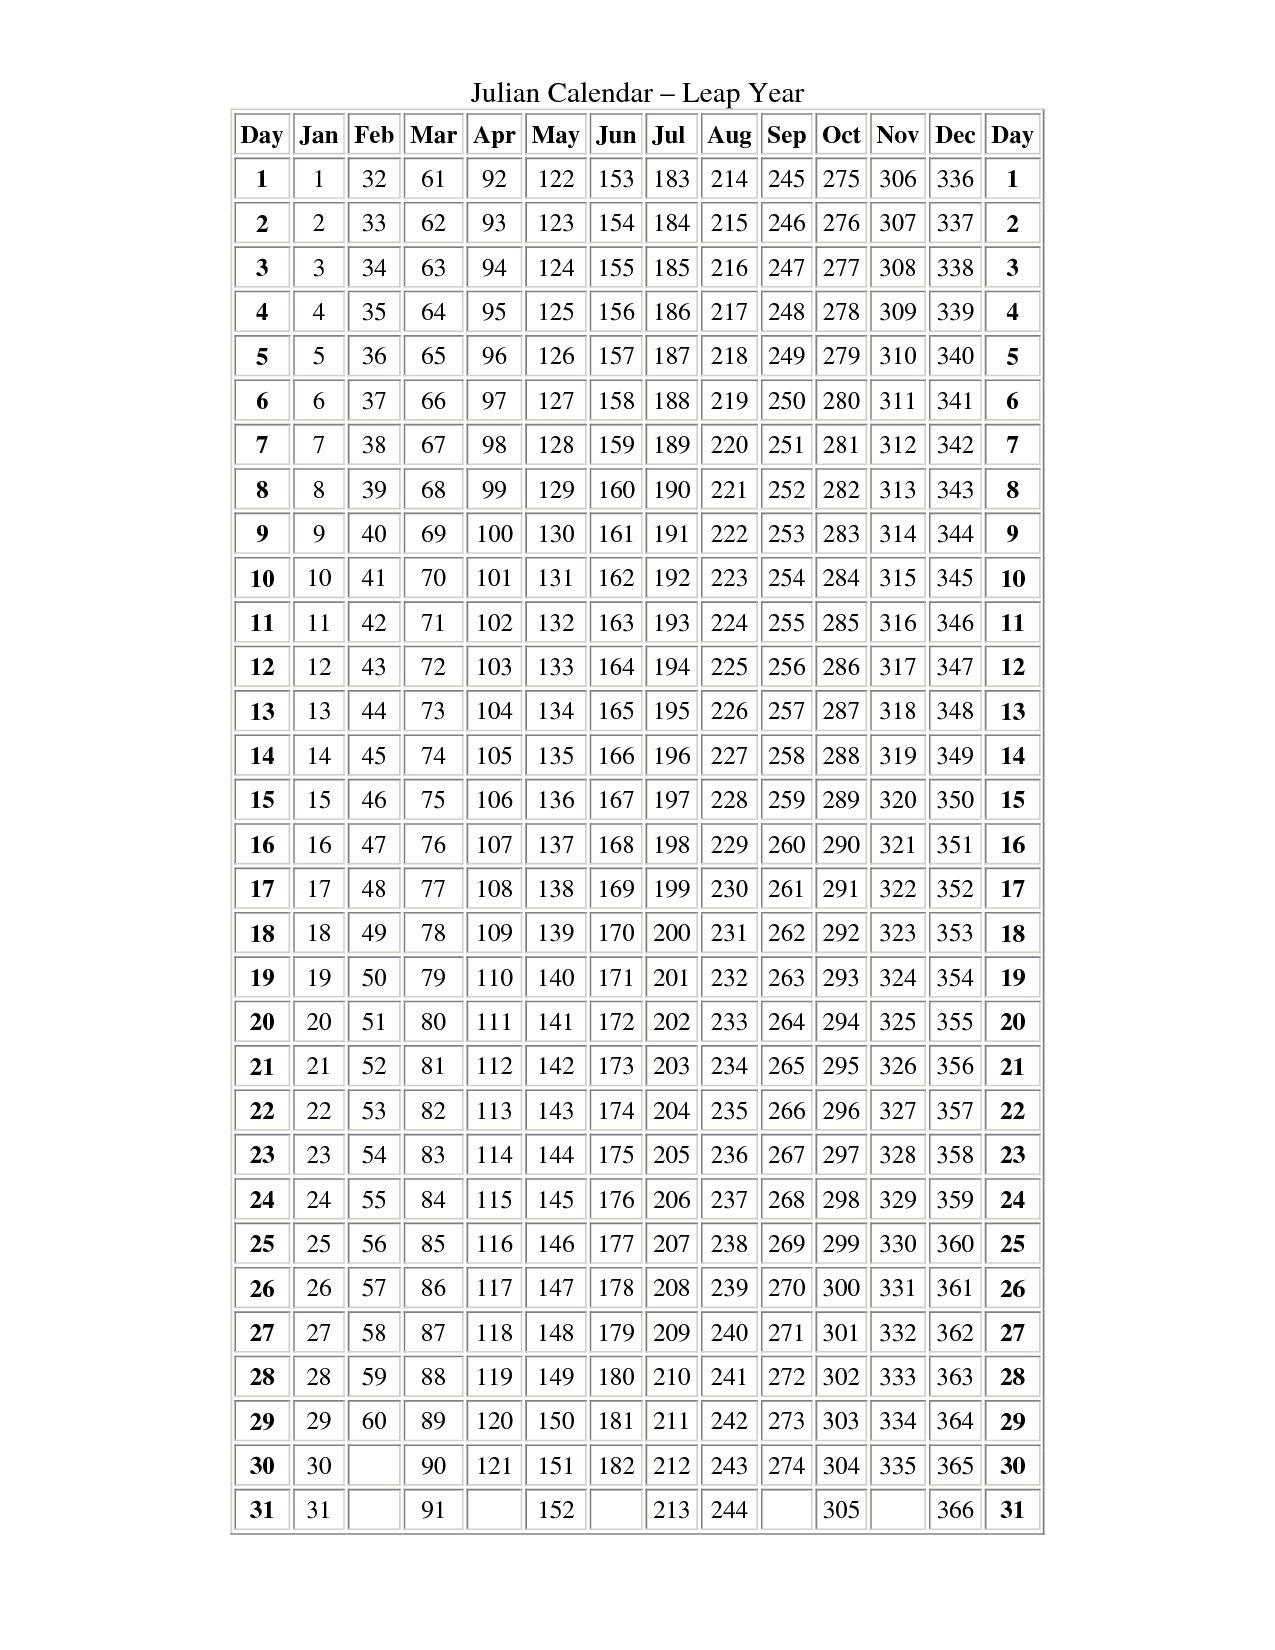 Julian Calendar Leap Year And Non Leap Year Printable In 2021 Leap Year Calendar Calendar Printables Calendar Template